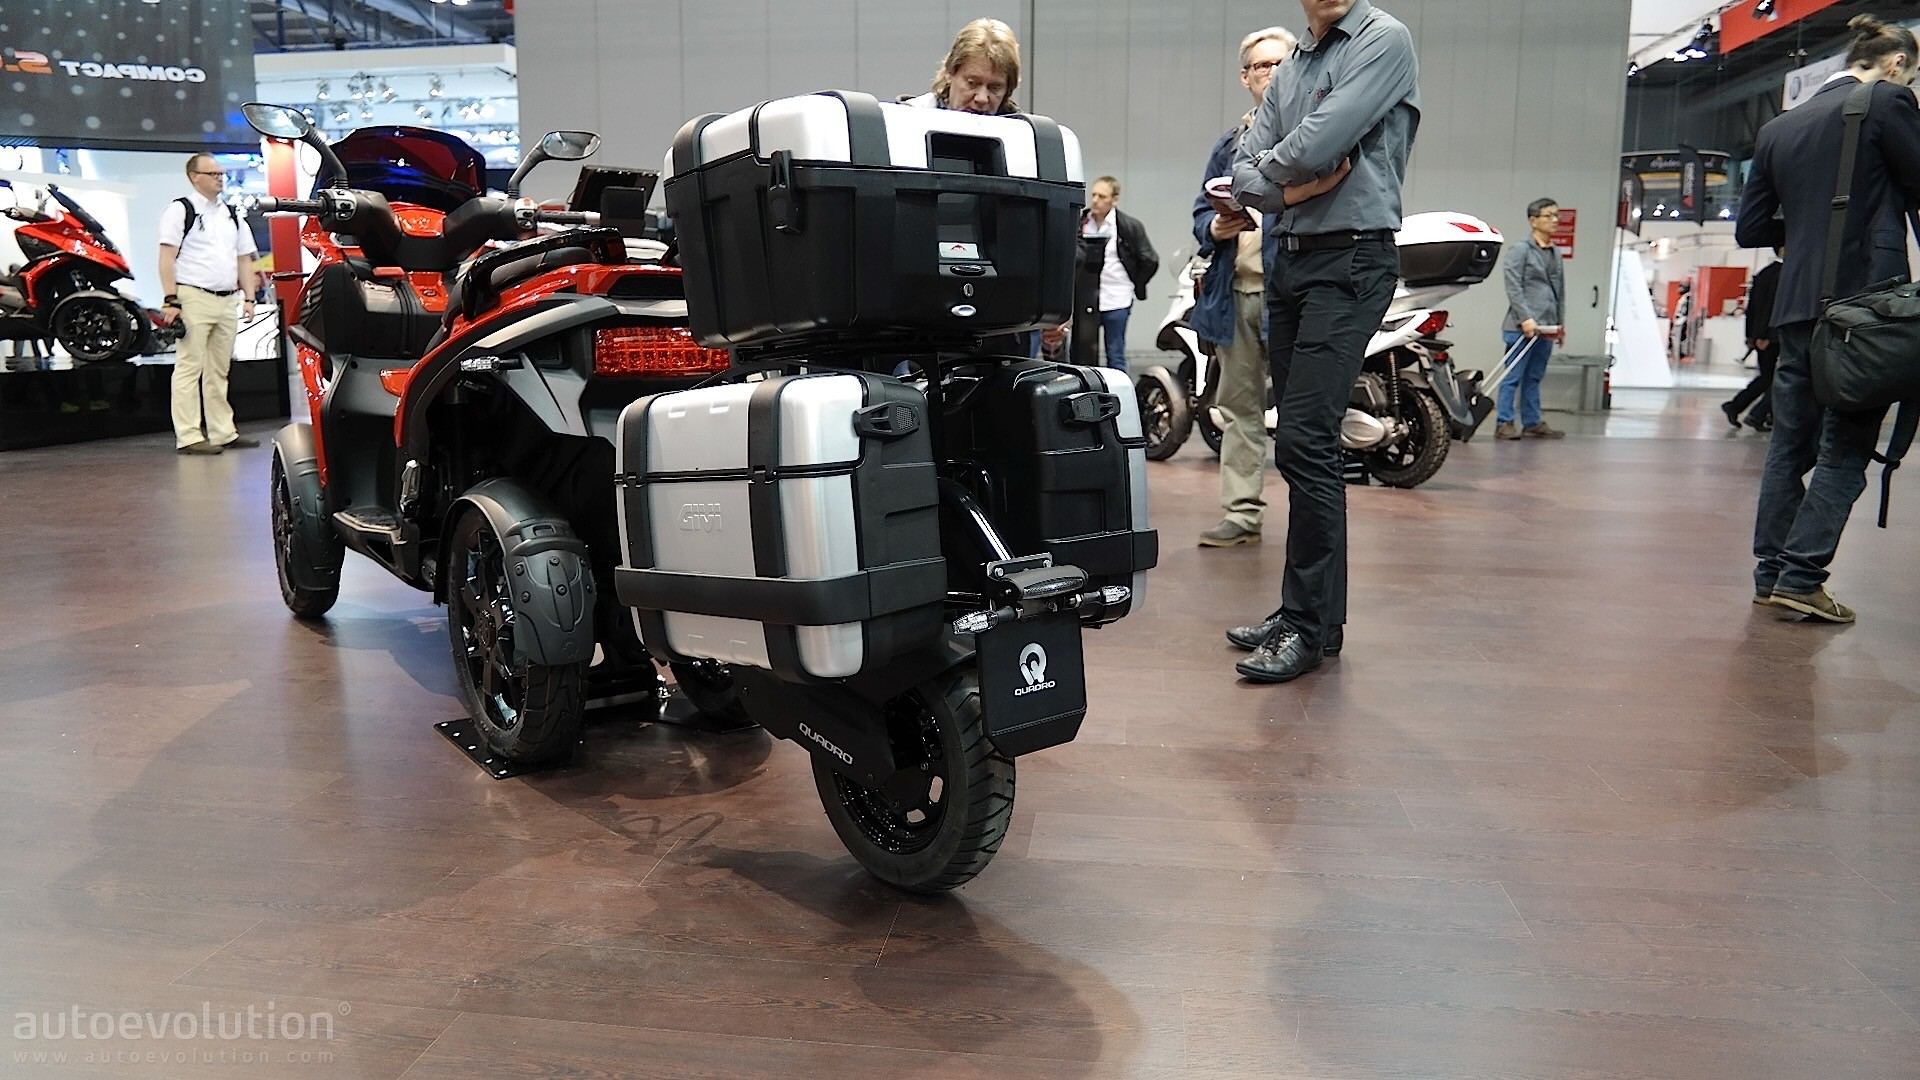 EICMA: Quadro Big Q Becomes Smart and Rugged - autoevolution